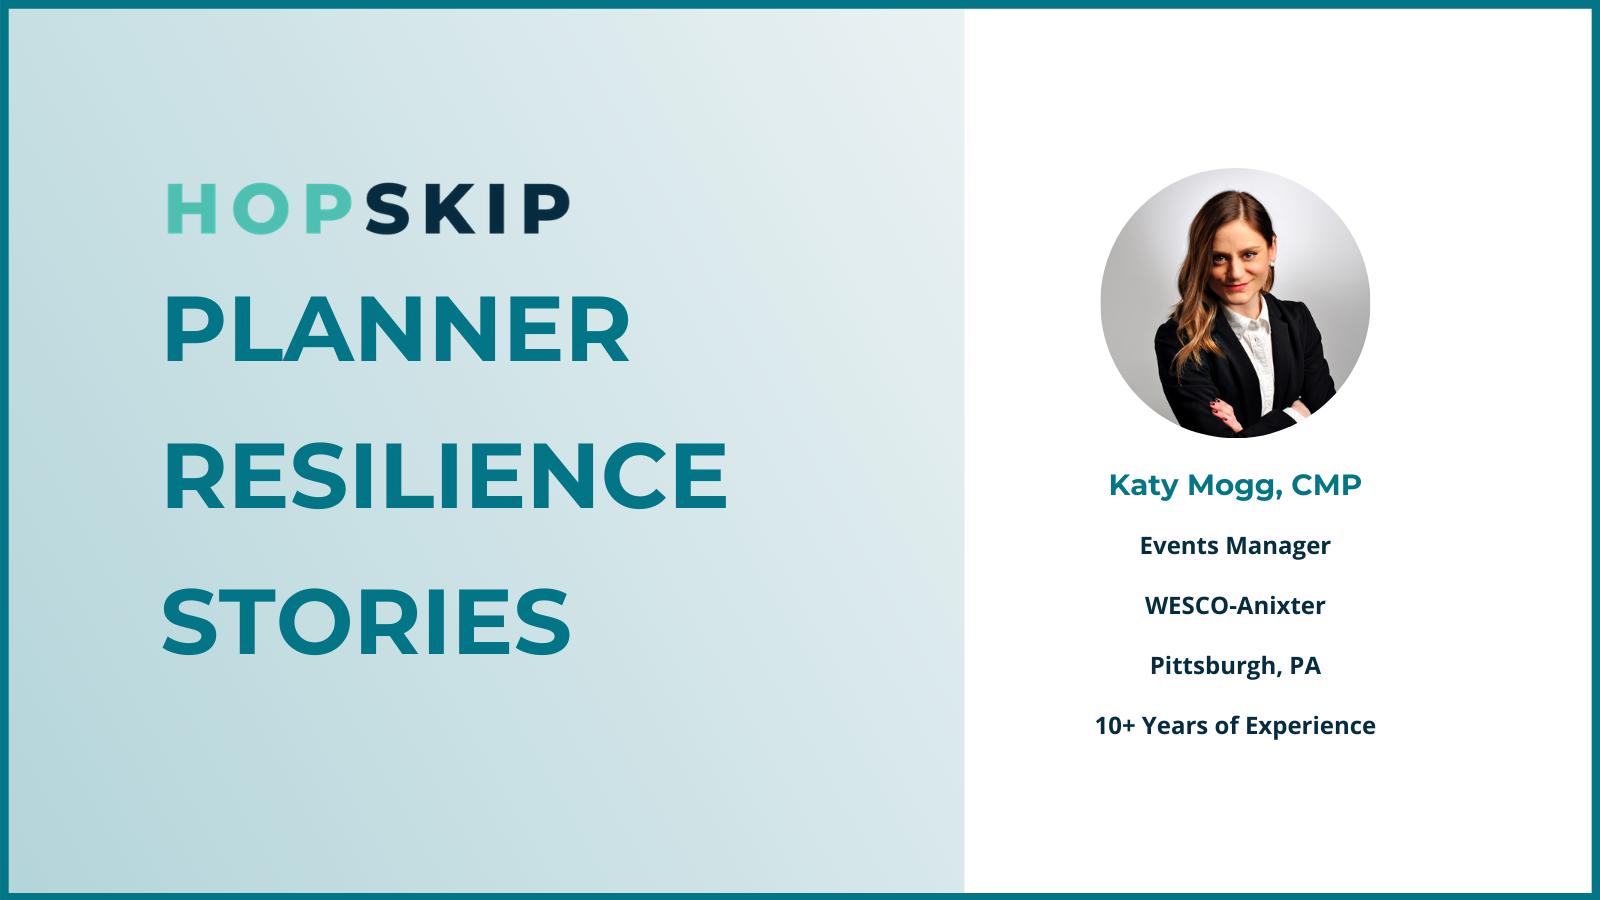 Katy Mogg Anixter-WESCO HopSkip Planner Resilience Stories